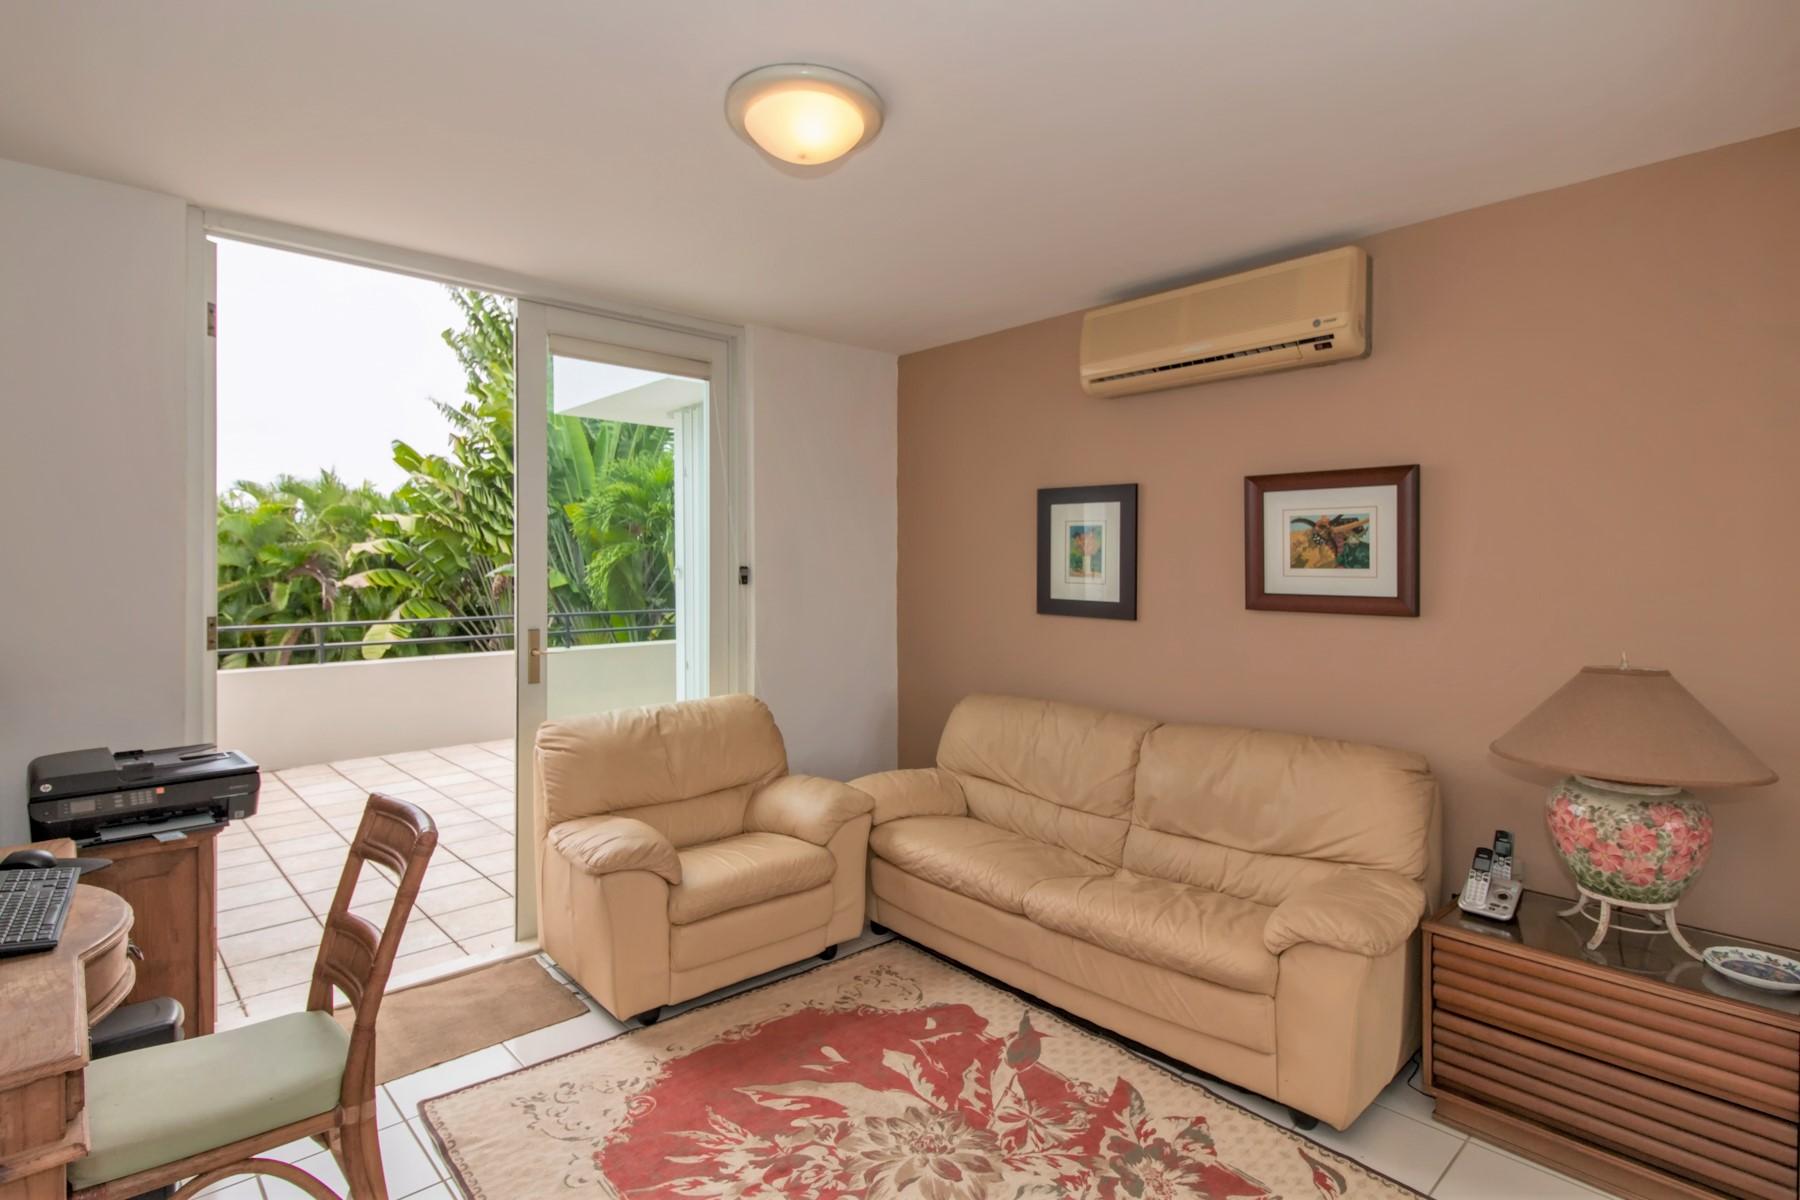 Additional photo for property listing at Scenic Montehiedra Home 284 Calle Jilguero San Juan, Puerto Rico 00926 Puerto Rico